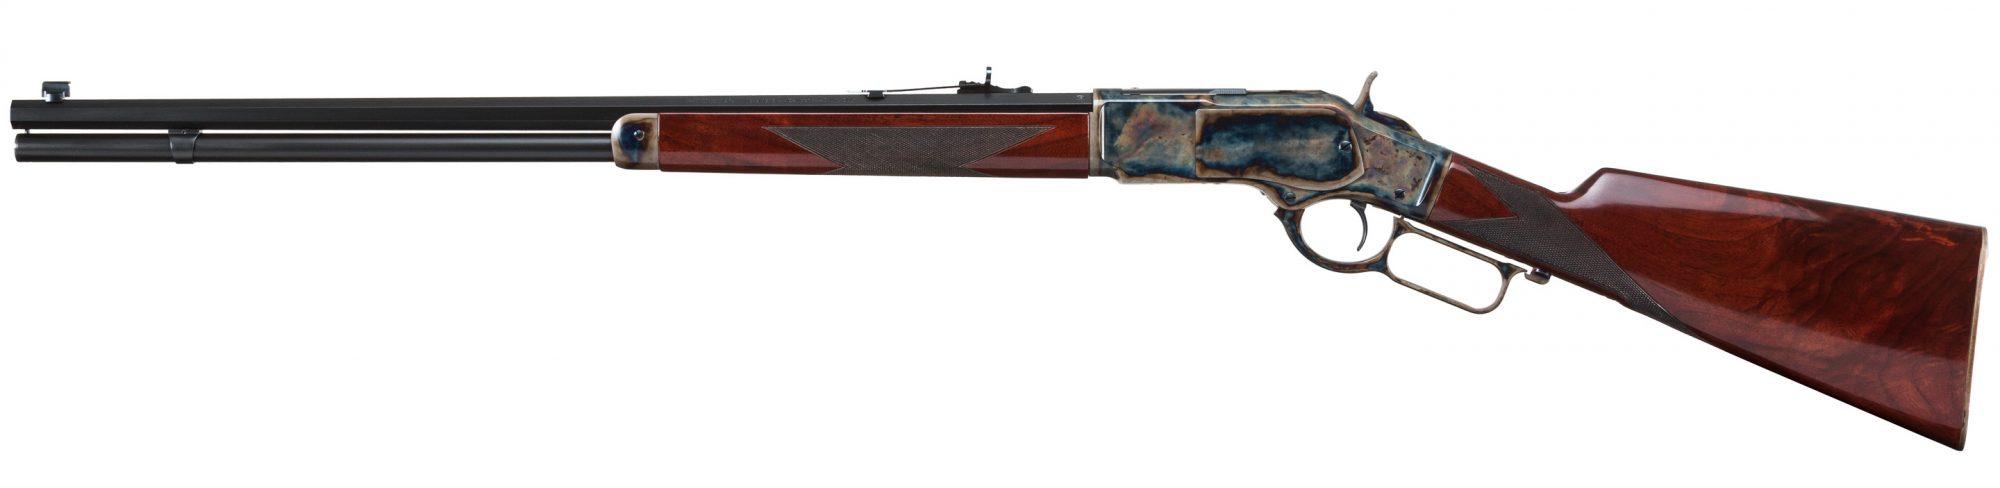 6306 Turnbull Winchester 1873 44 00108ZT73Y